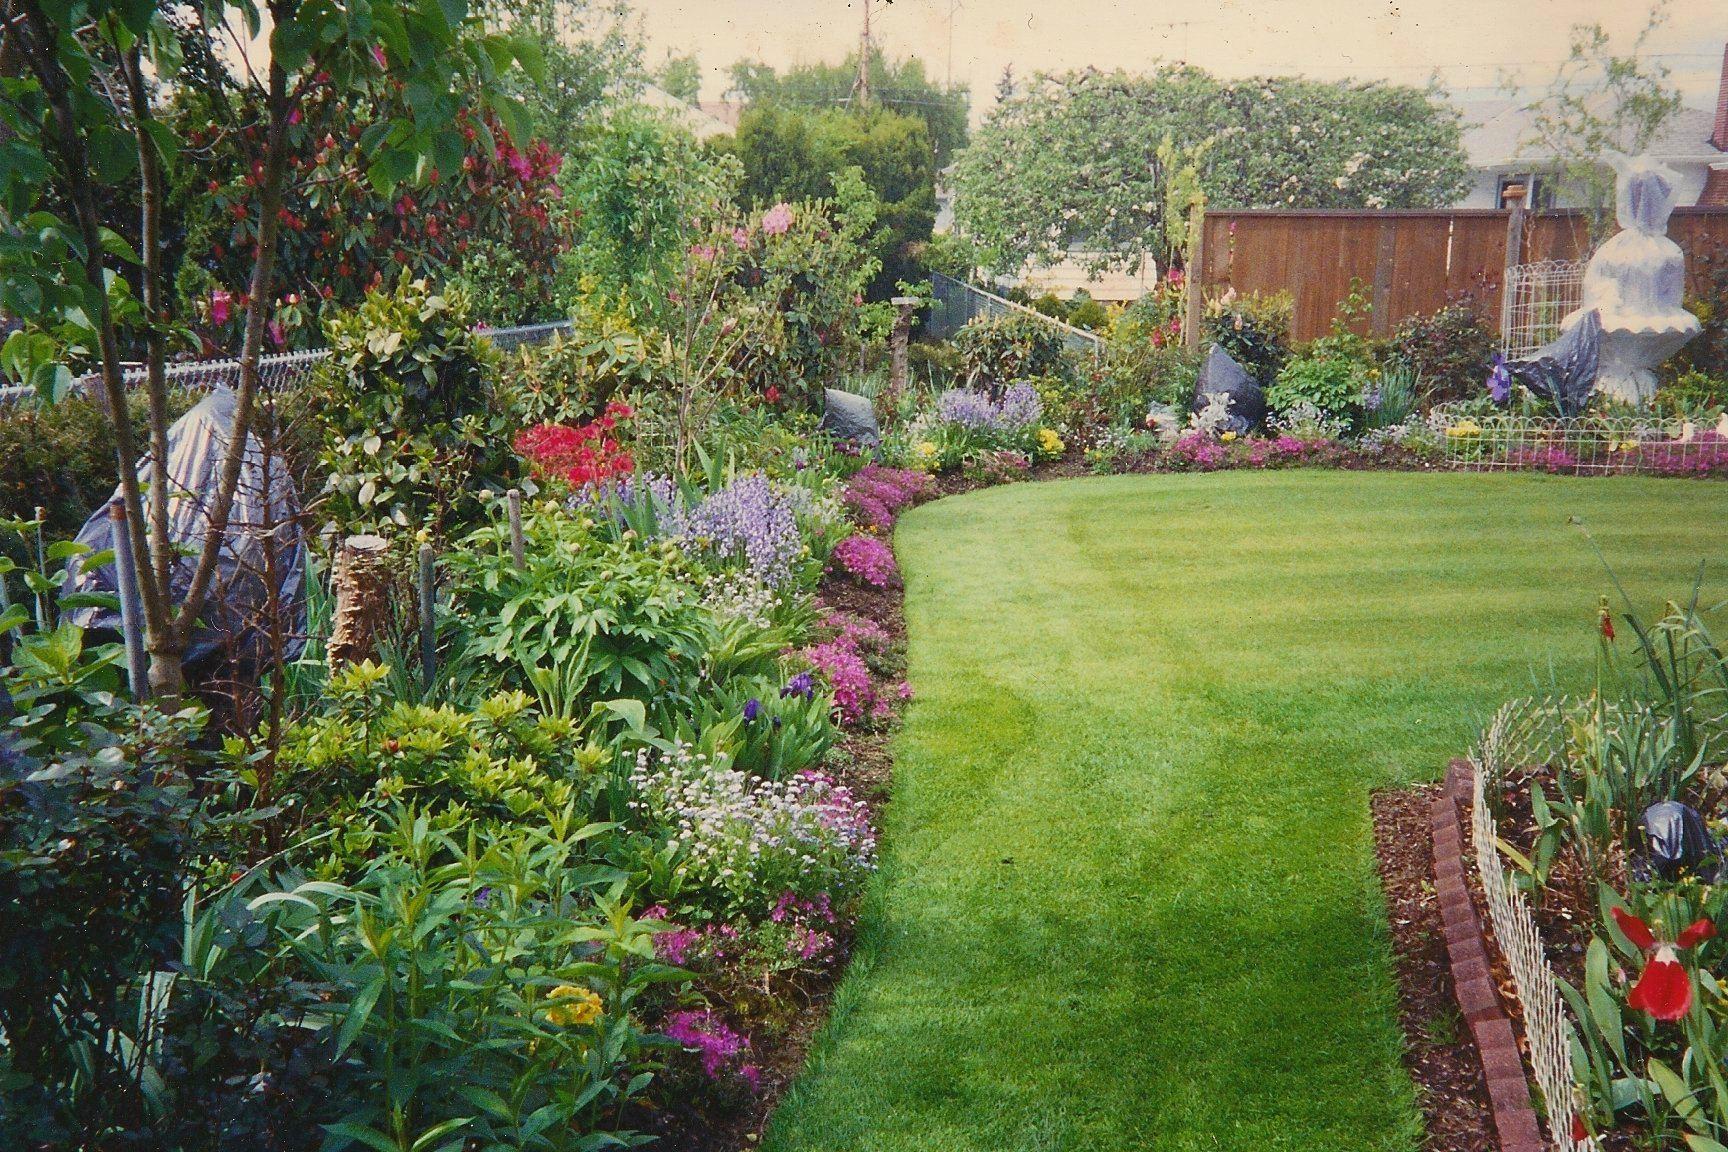 Backyard Flower Garden Designs - Beautiful Swish Flowers Fresh Green ...